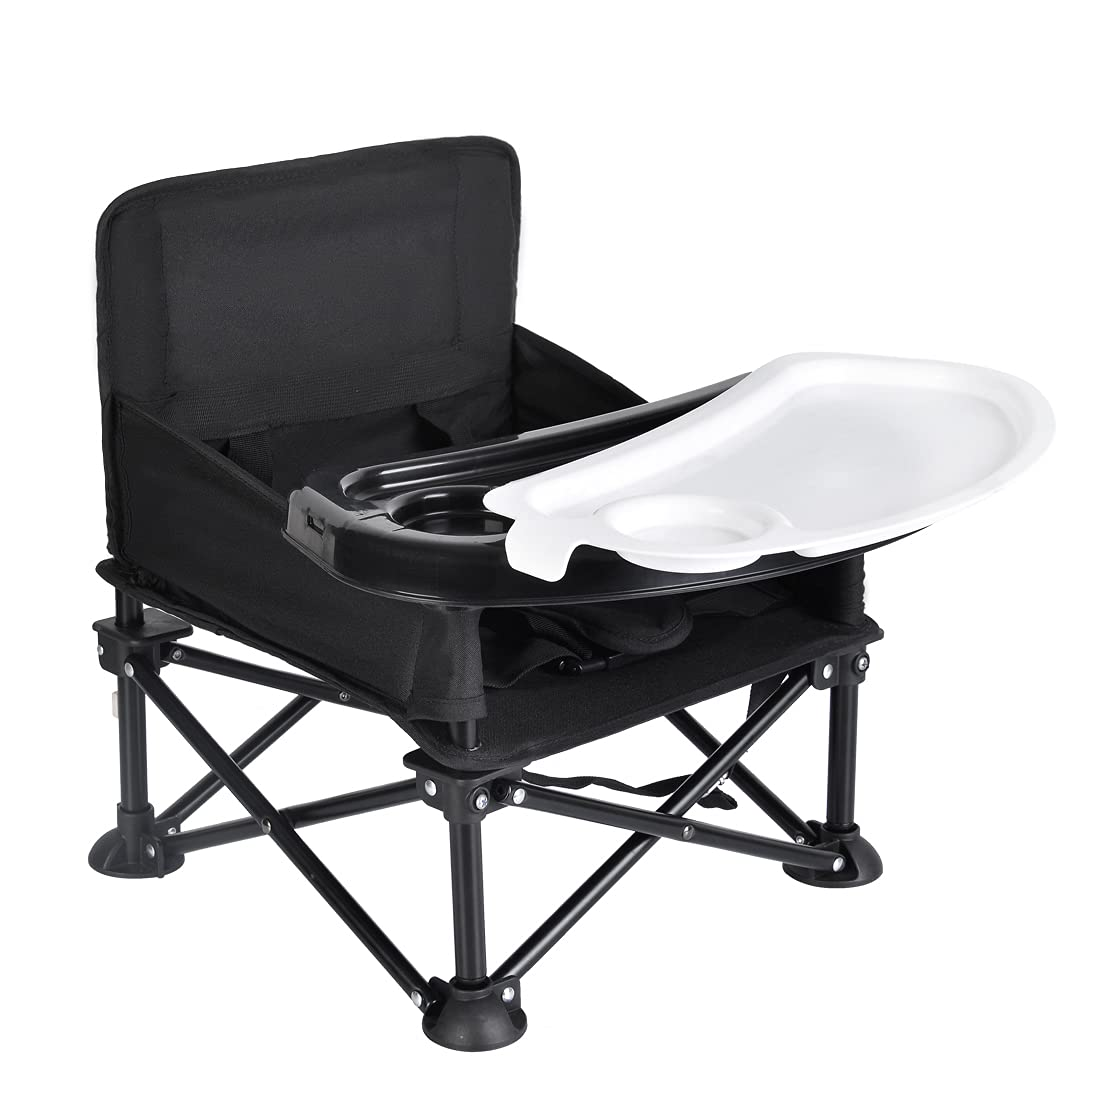 Manlisa Travel Booster Popular popular Seat Max 84% OFF Activity Folding Hi Chair Portable